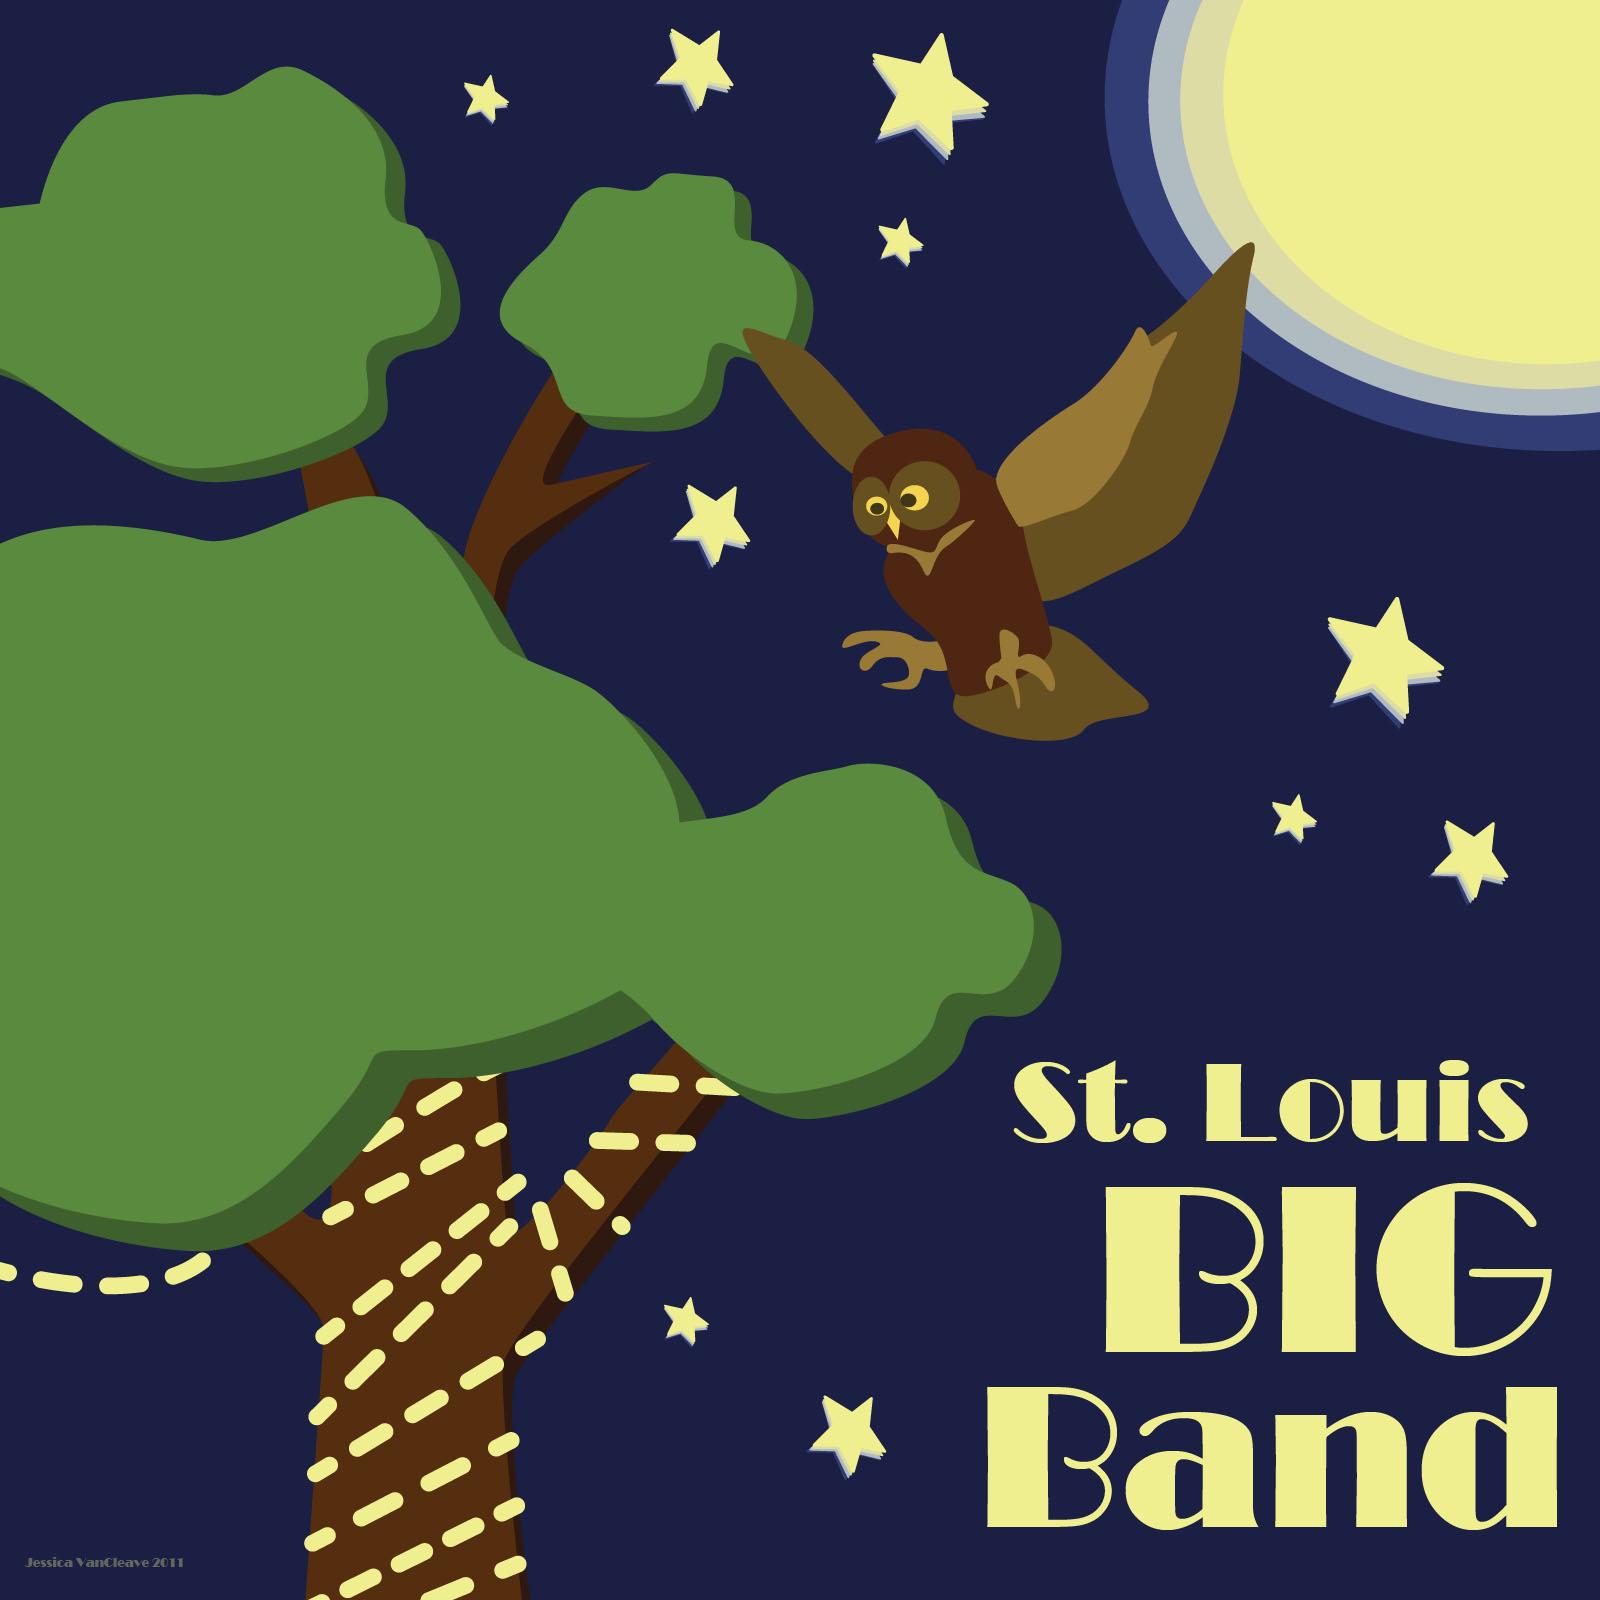 ST LOUIS BIG BAND ALBUM ART